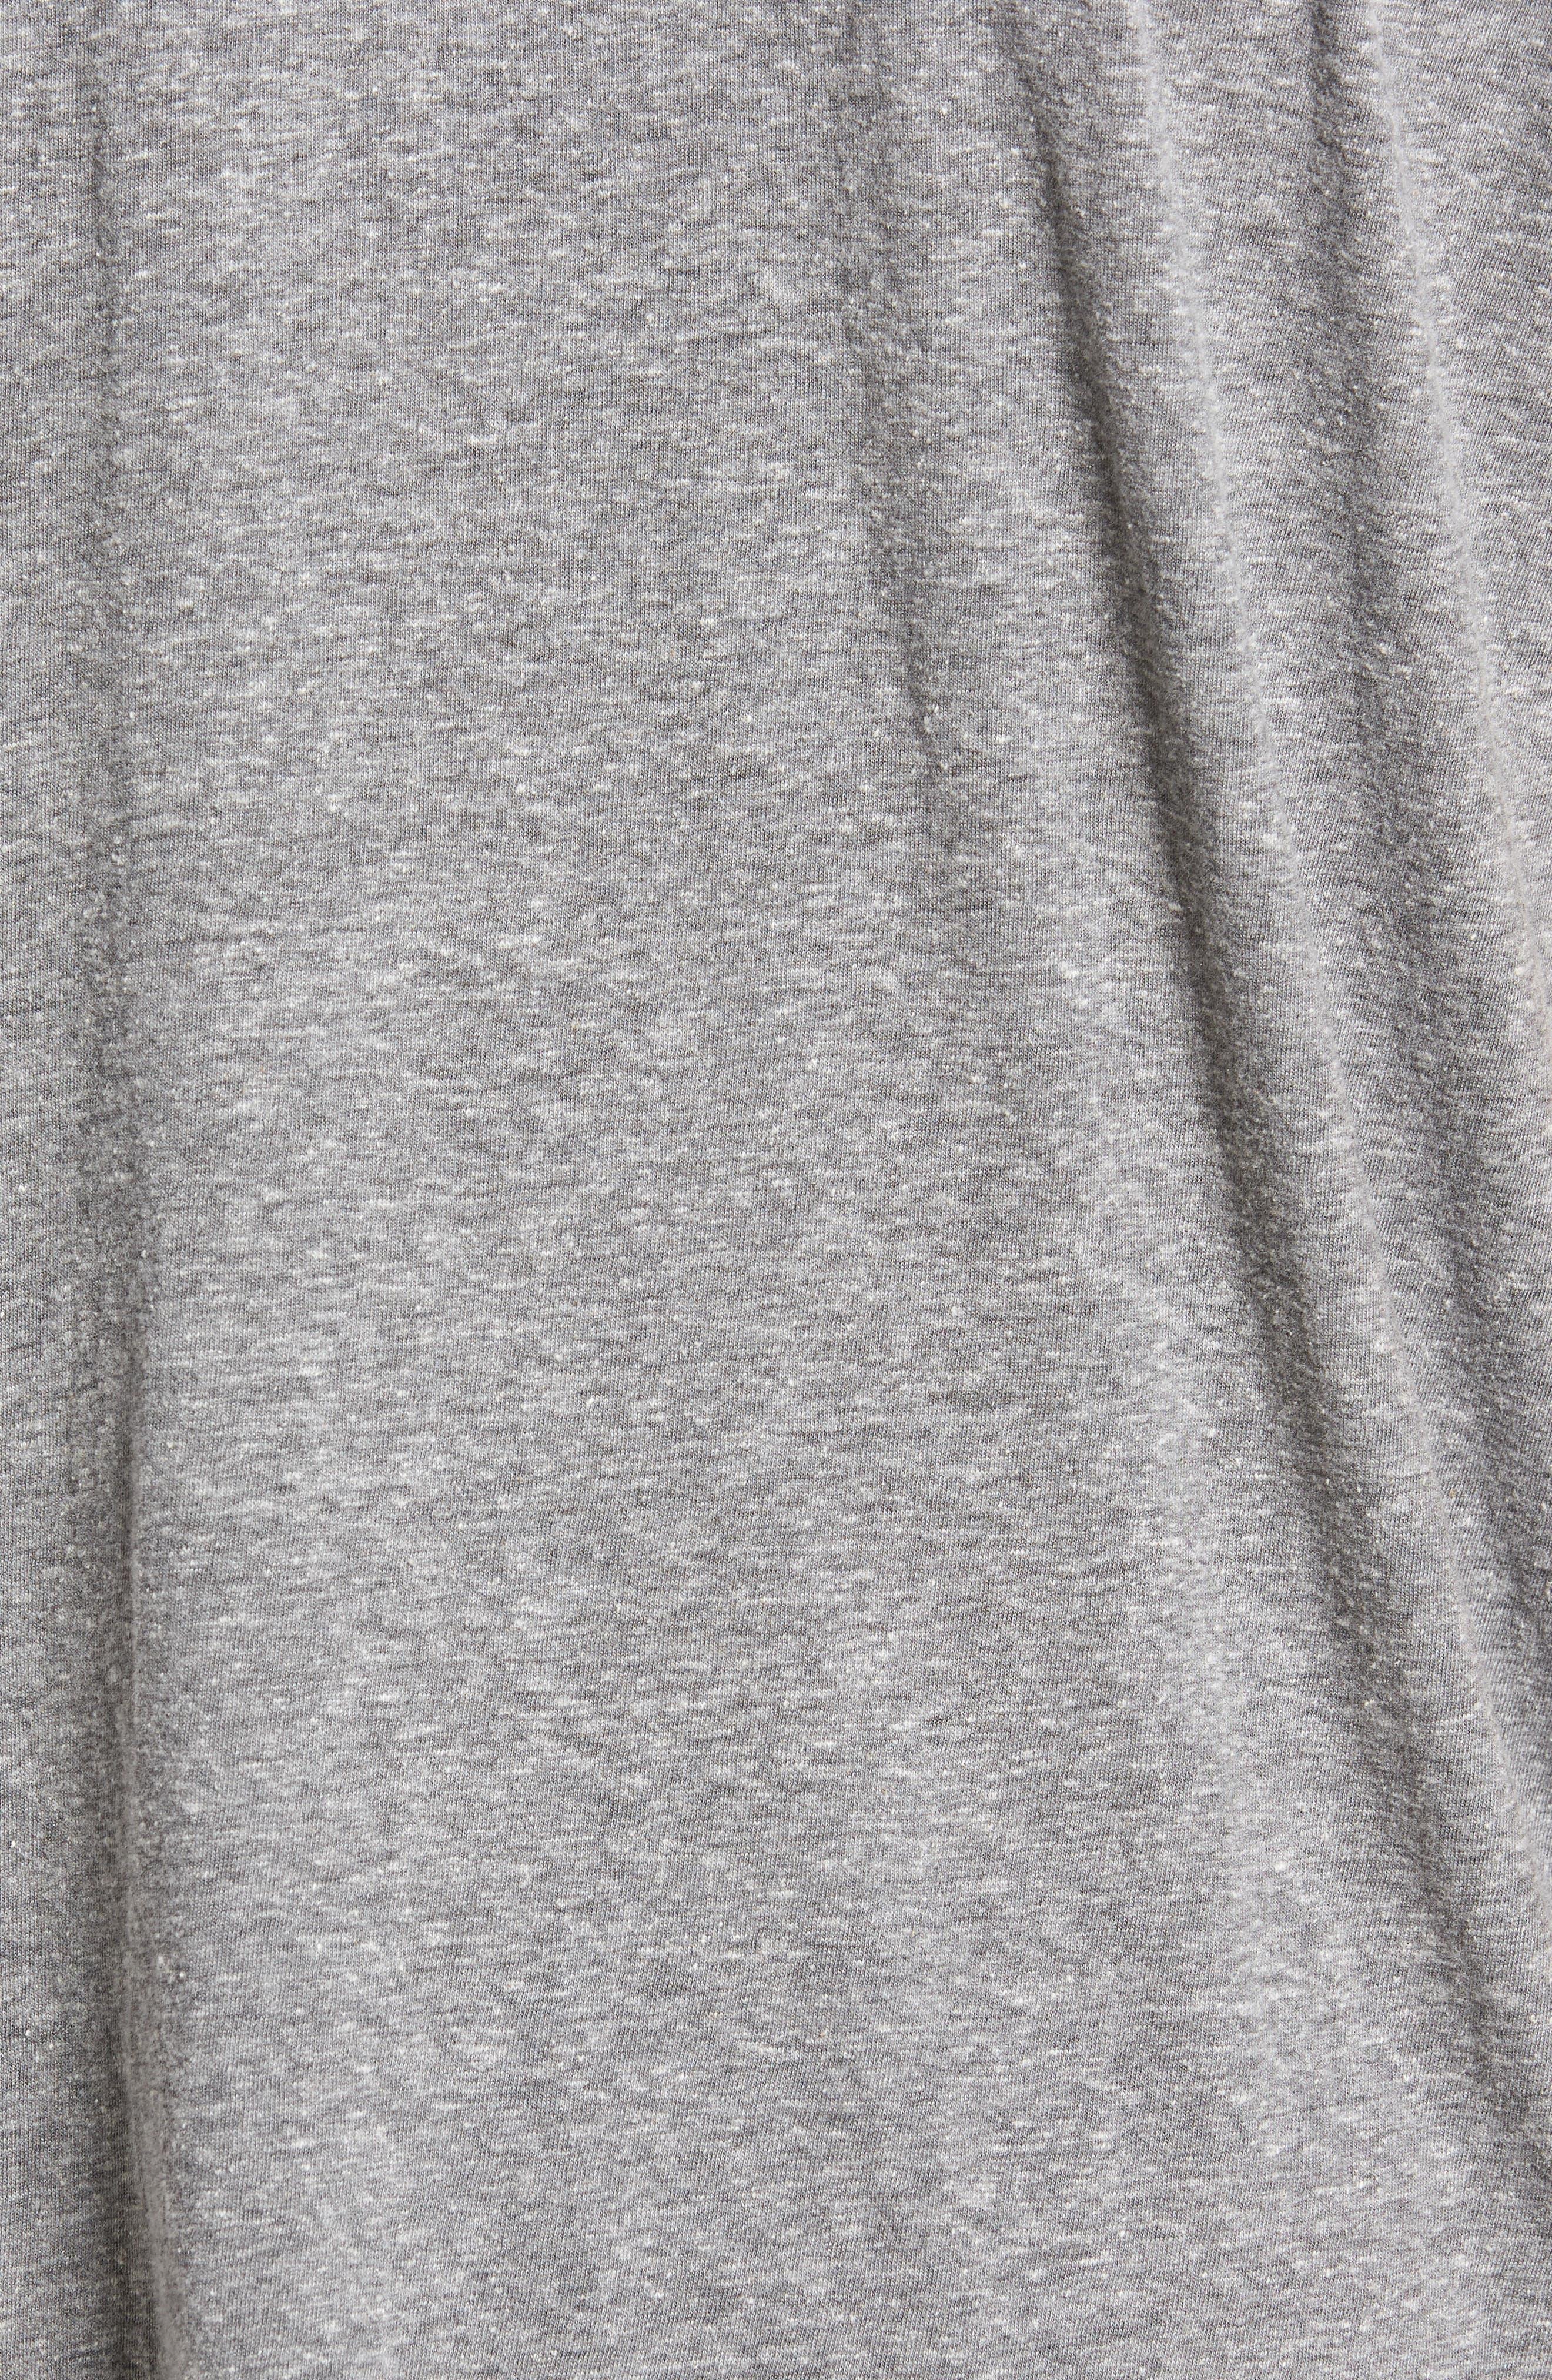 The Original Retro Brand Hot Dog Eating Champion T-Shirt,                             Alternate thumbnail 5, color,                             020